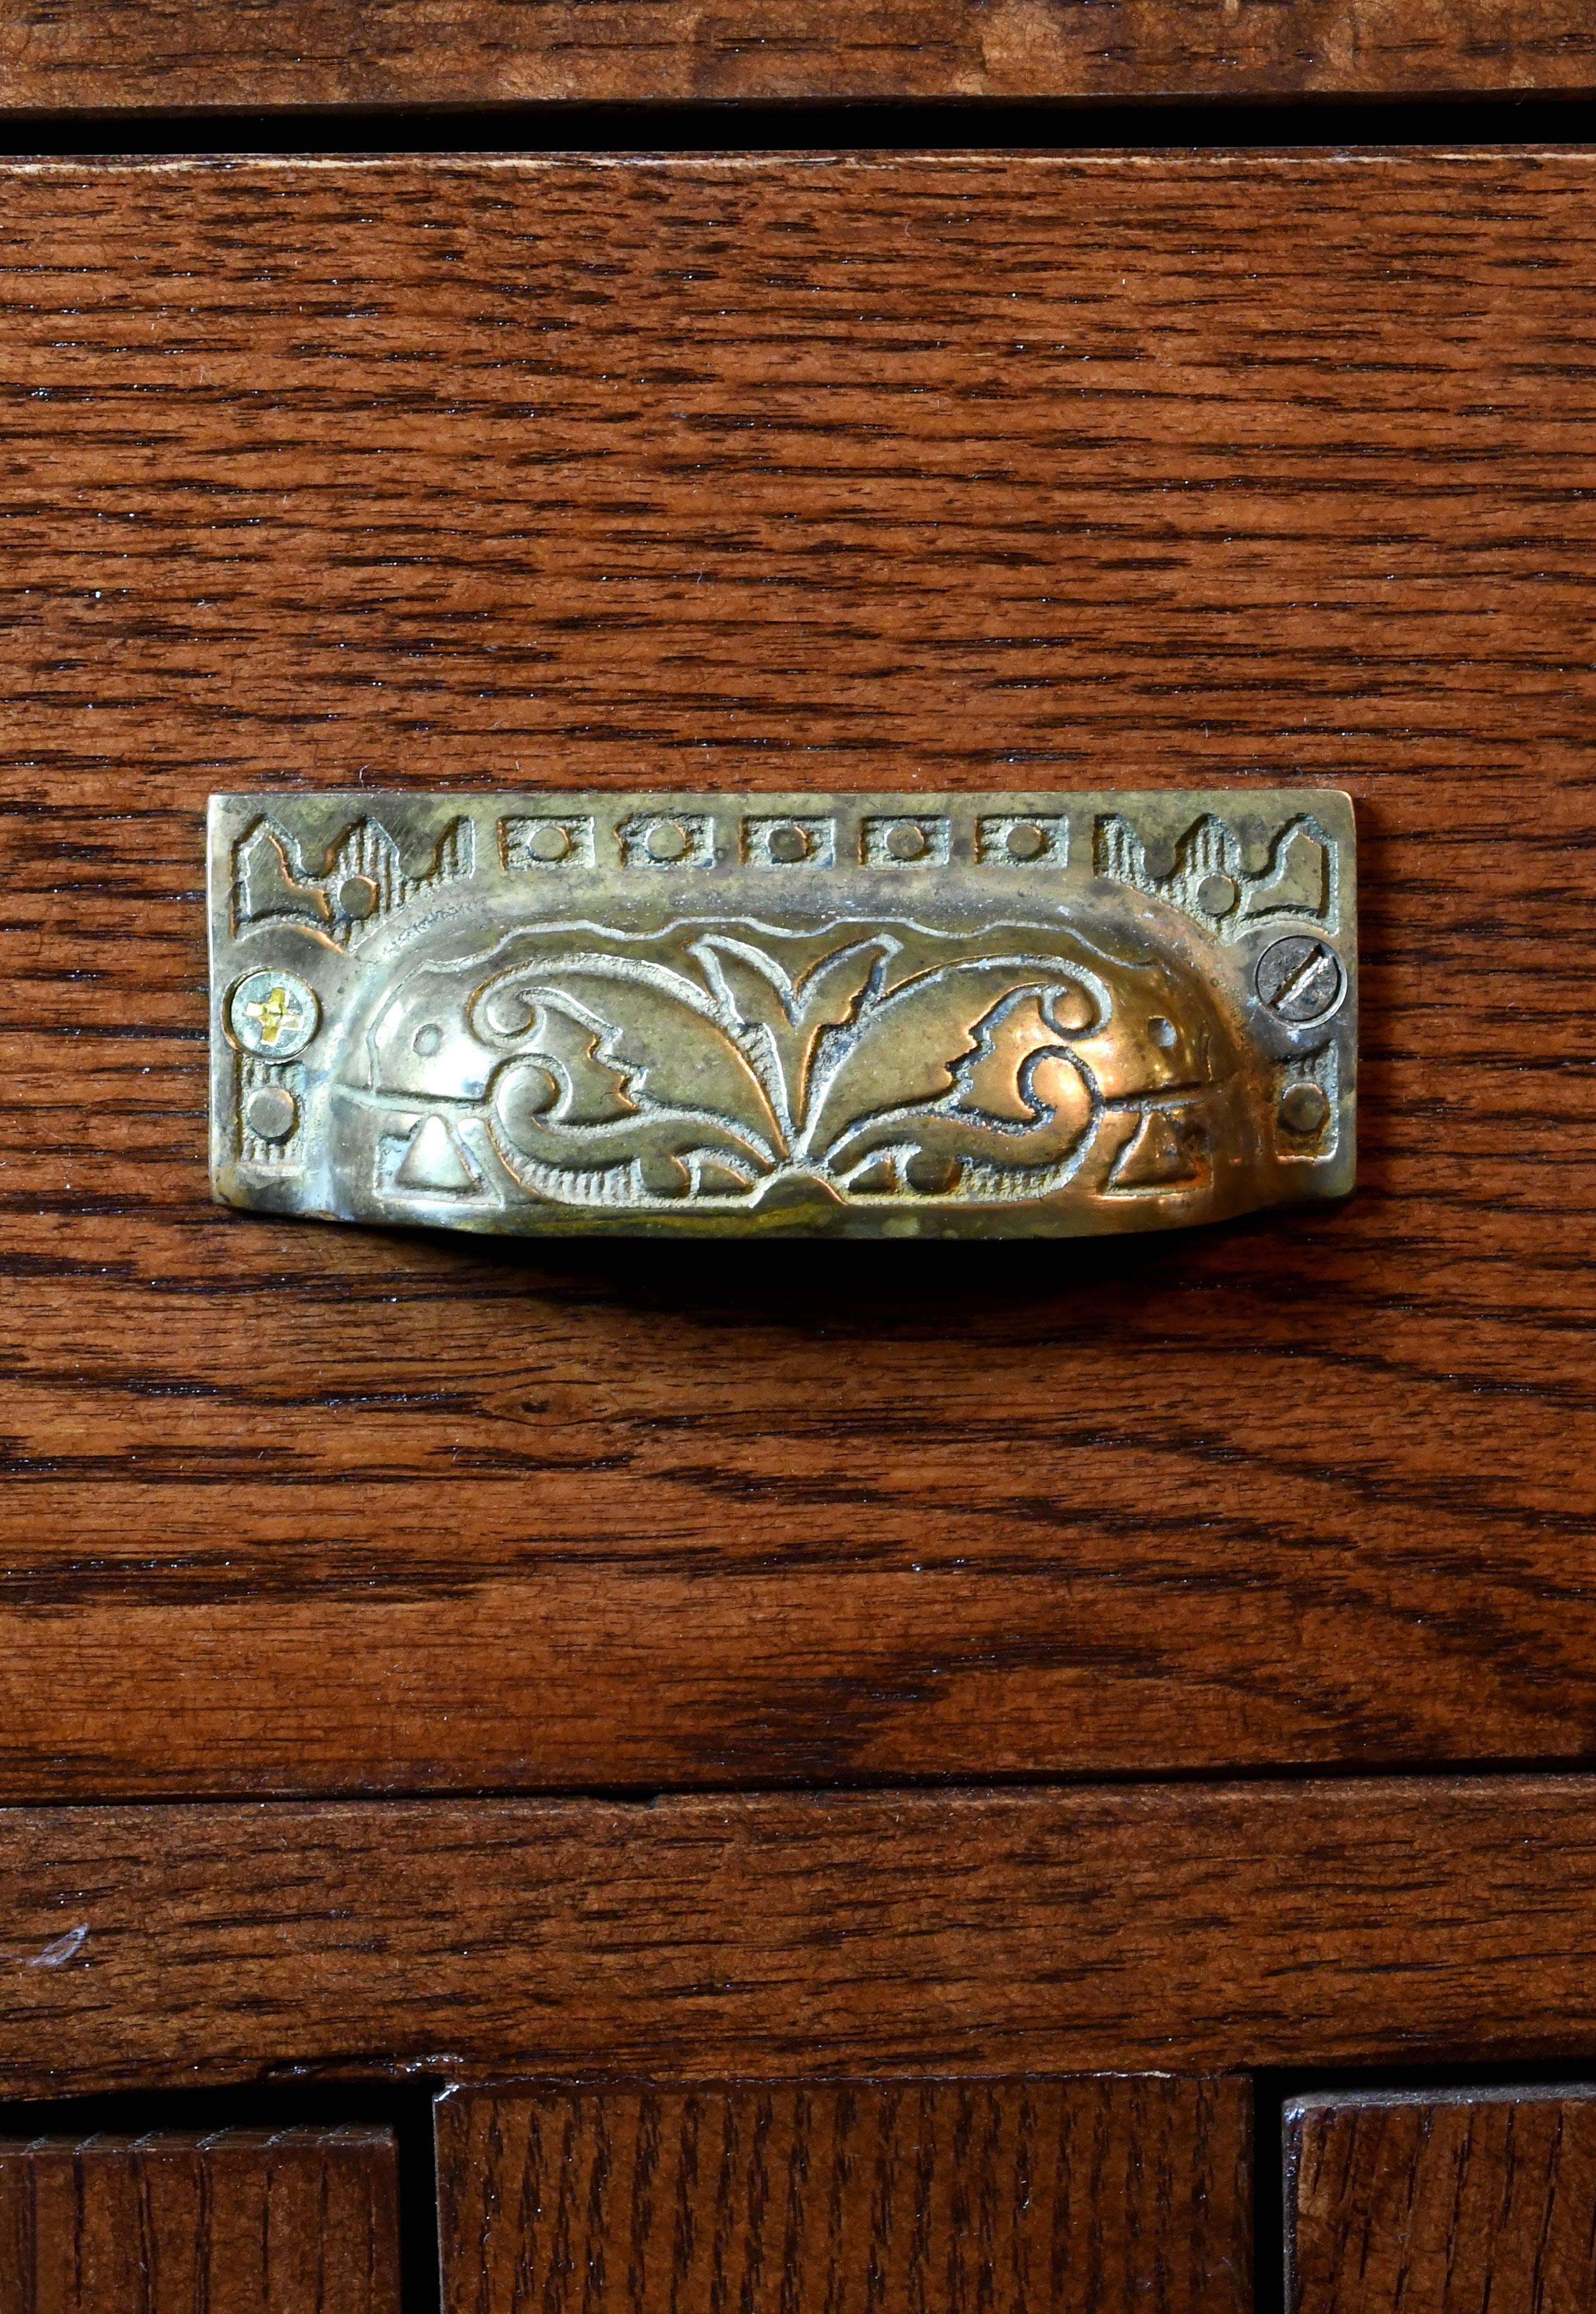 47422-brunswick-bar-handle-detail.jpg